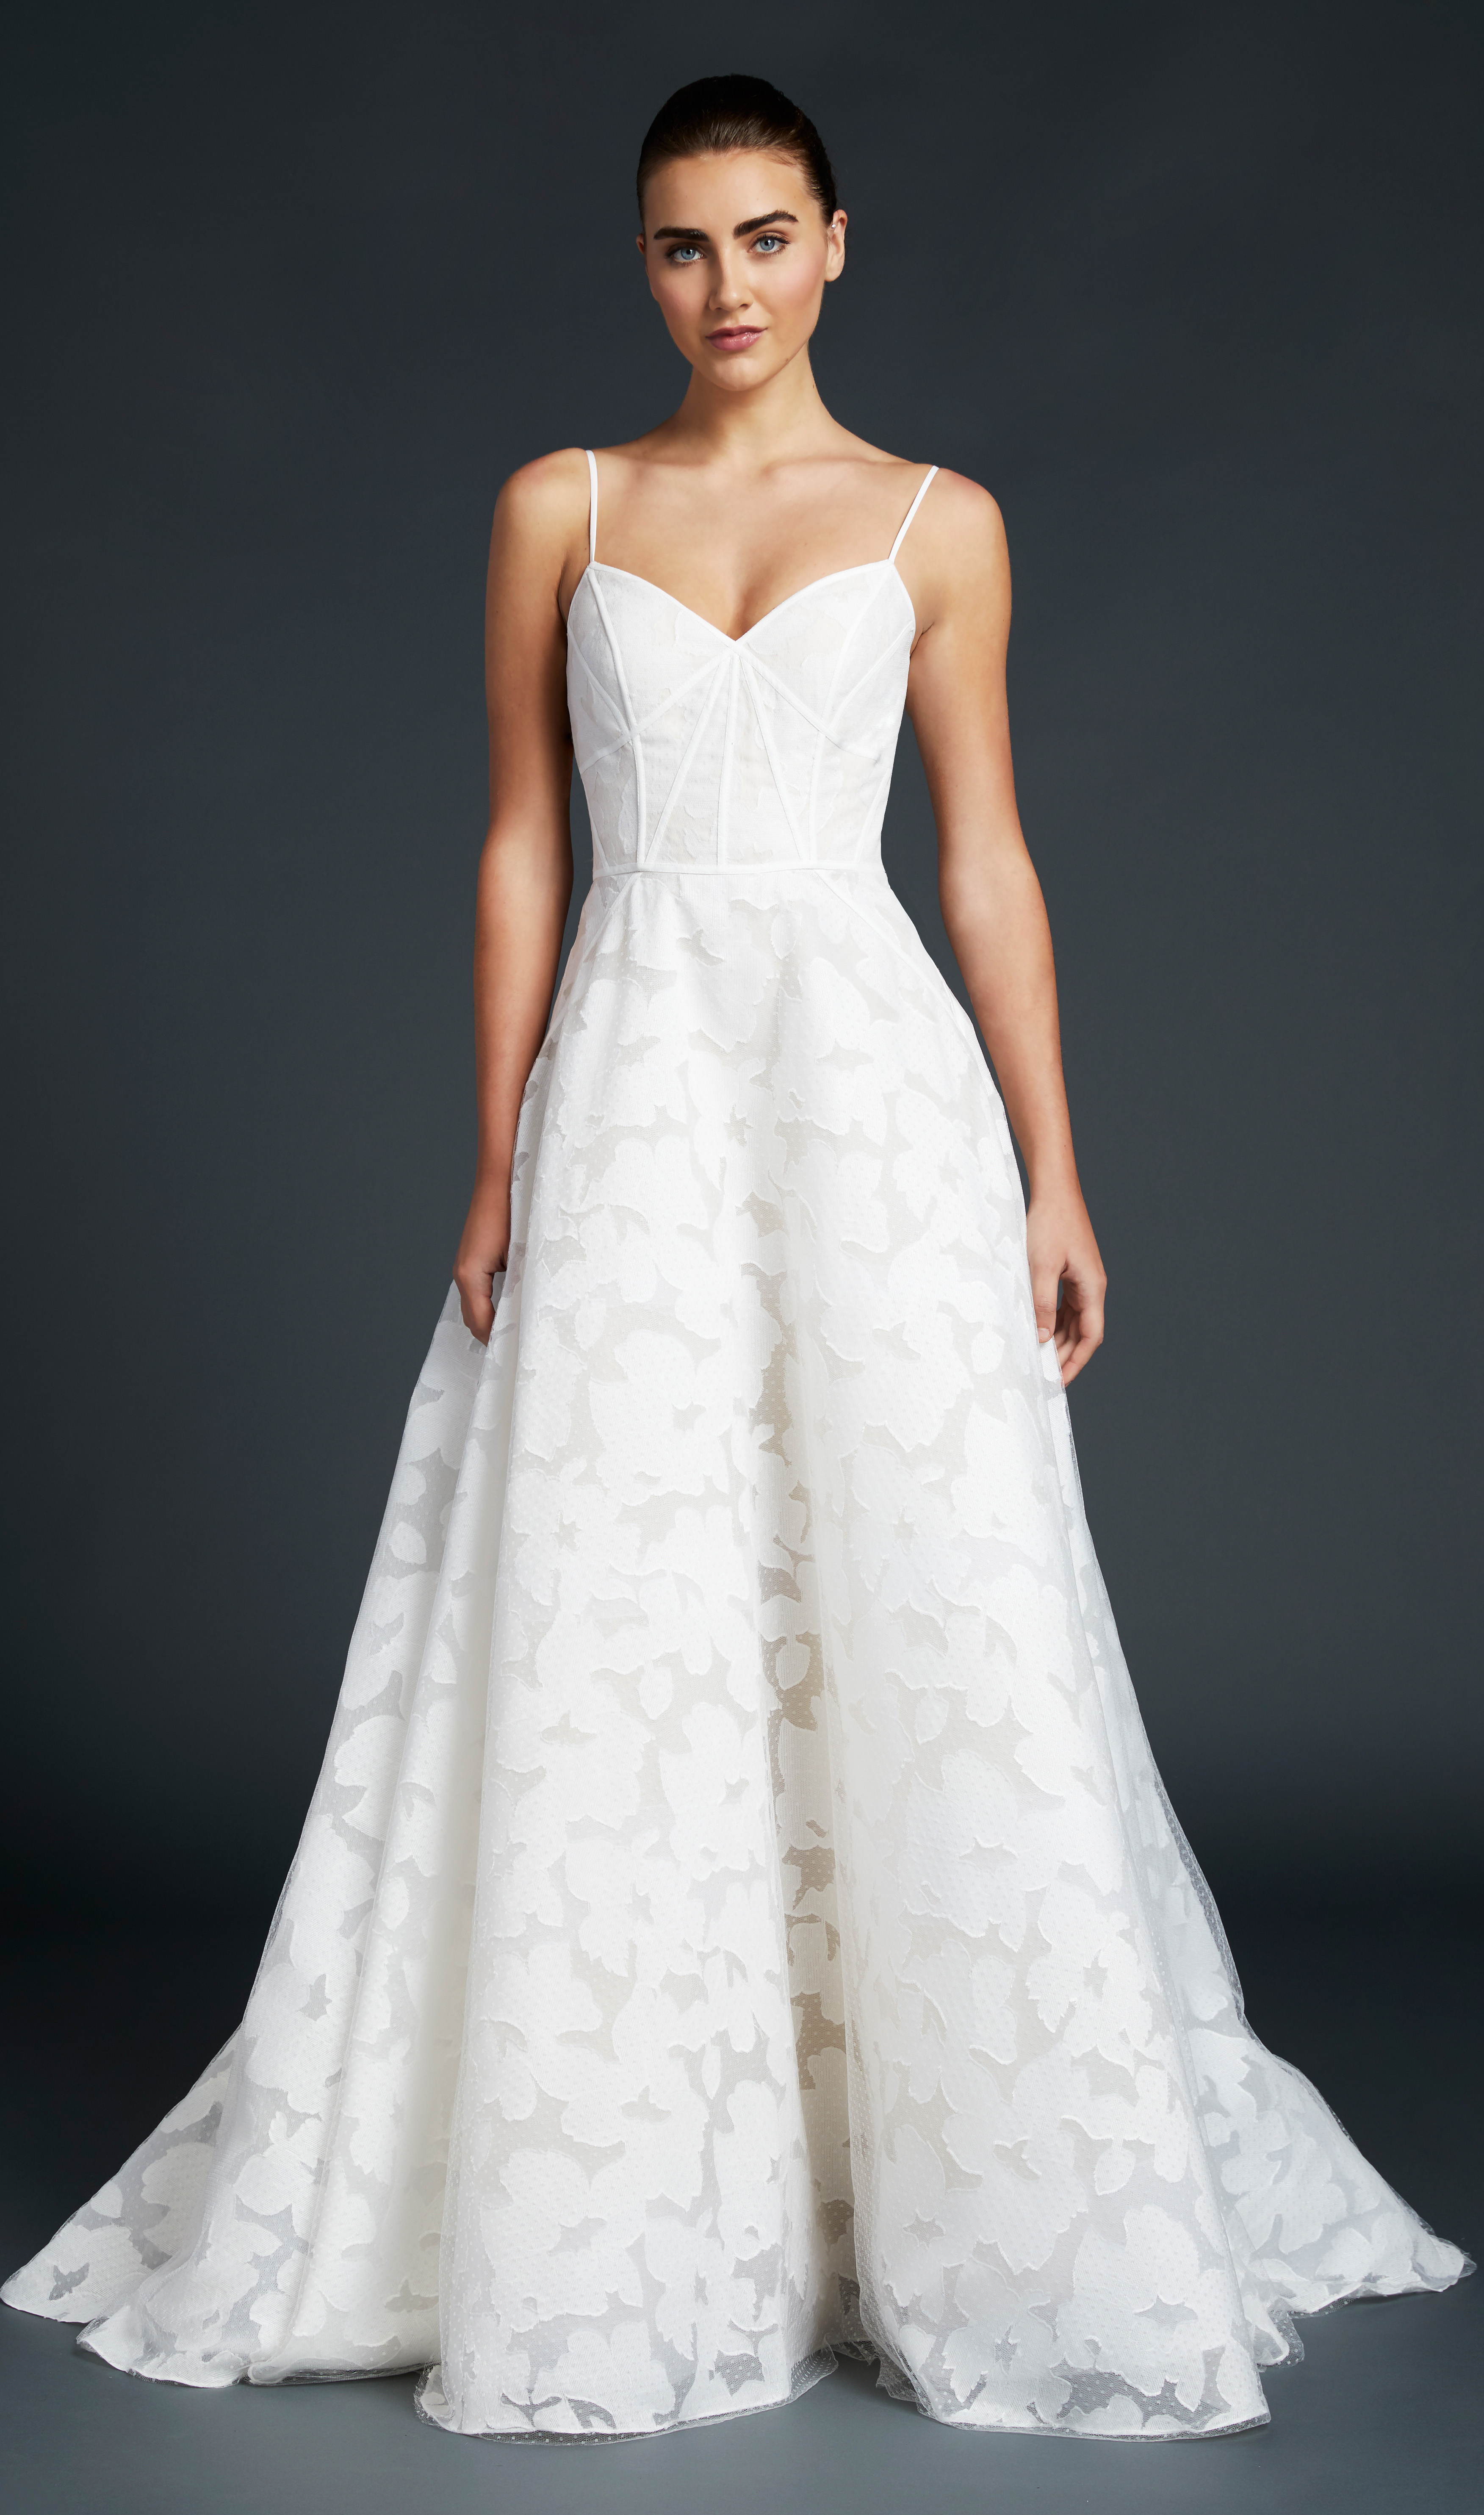 blue willow wedding dress spaghetti straps a-line flower pattern